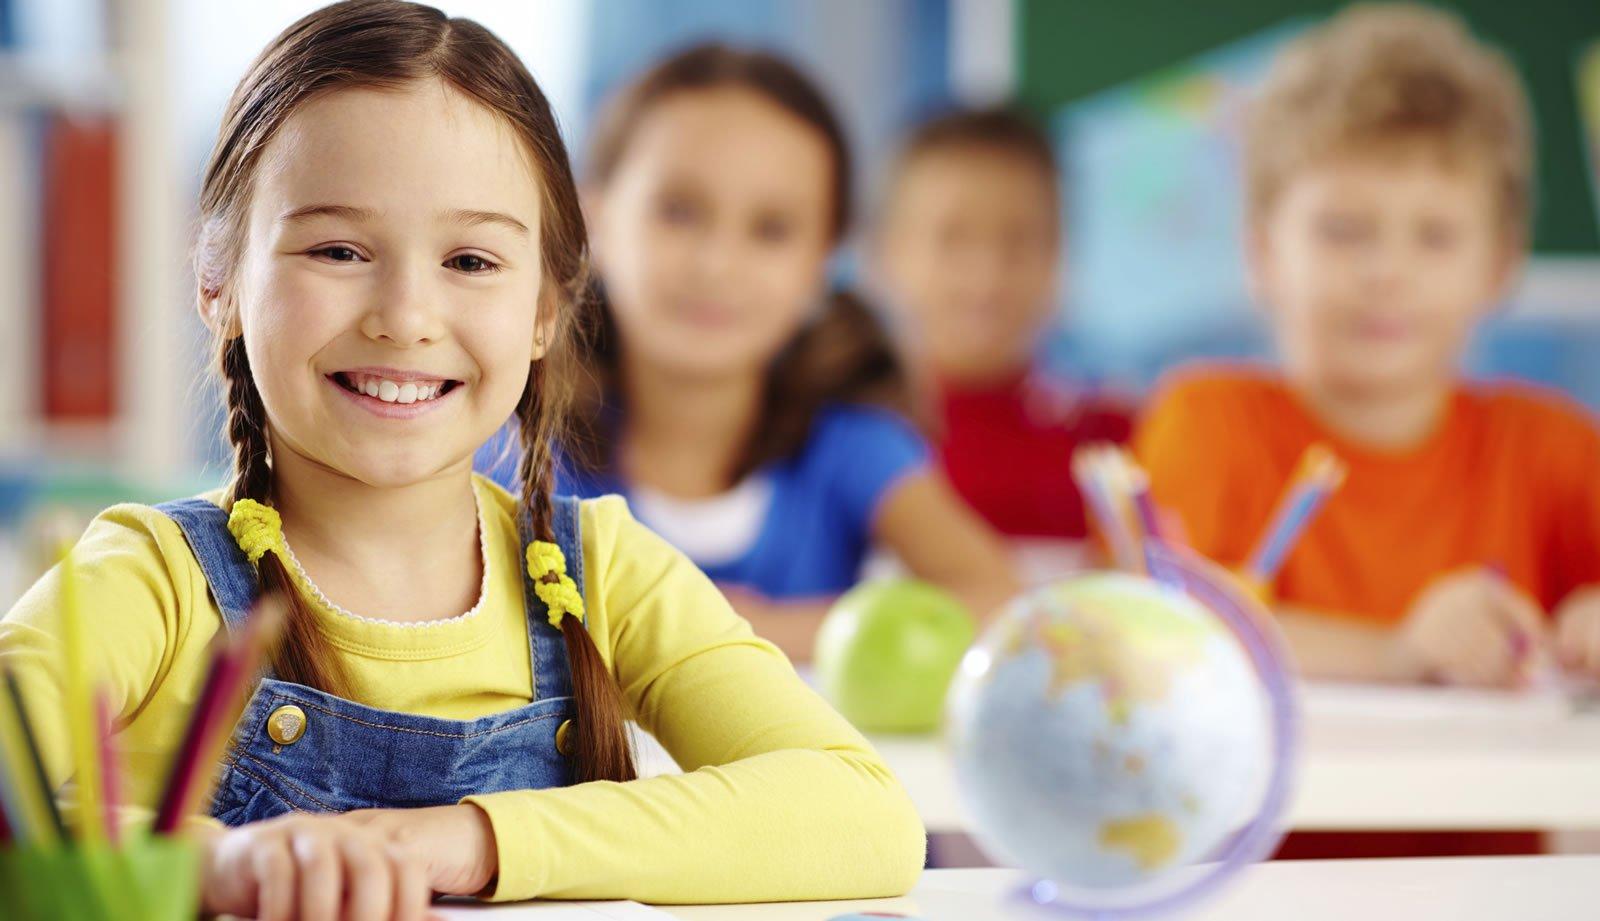 Indoor Playgrounds - Children Will Get Much More Fun!